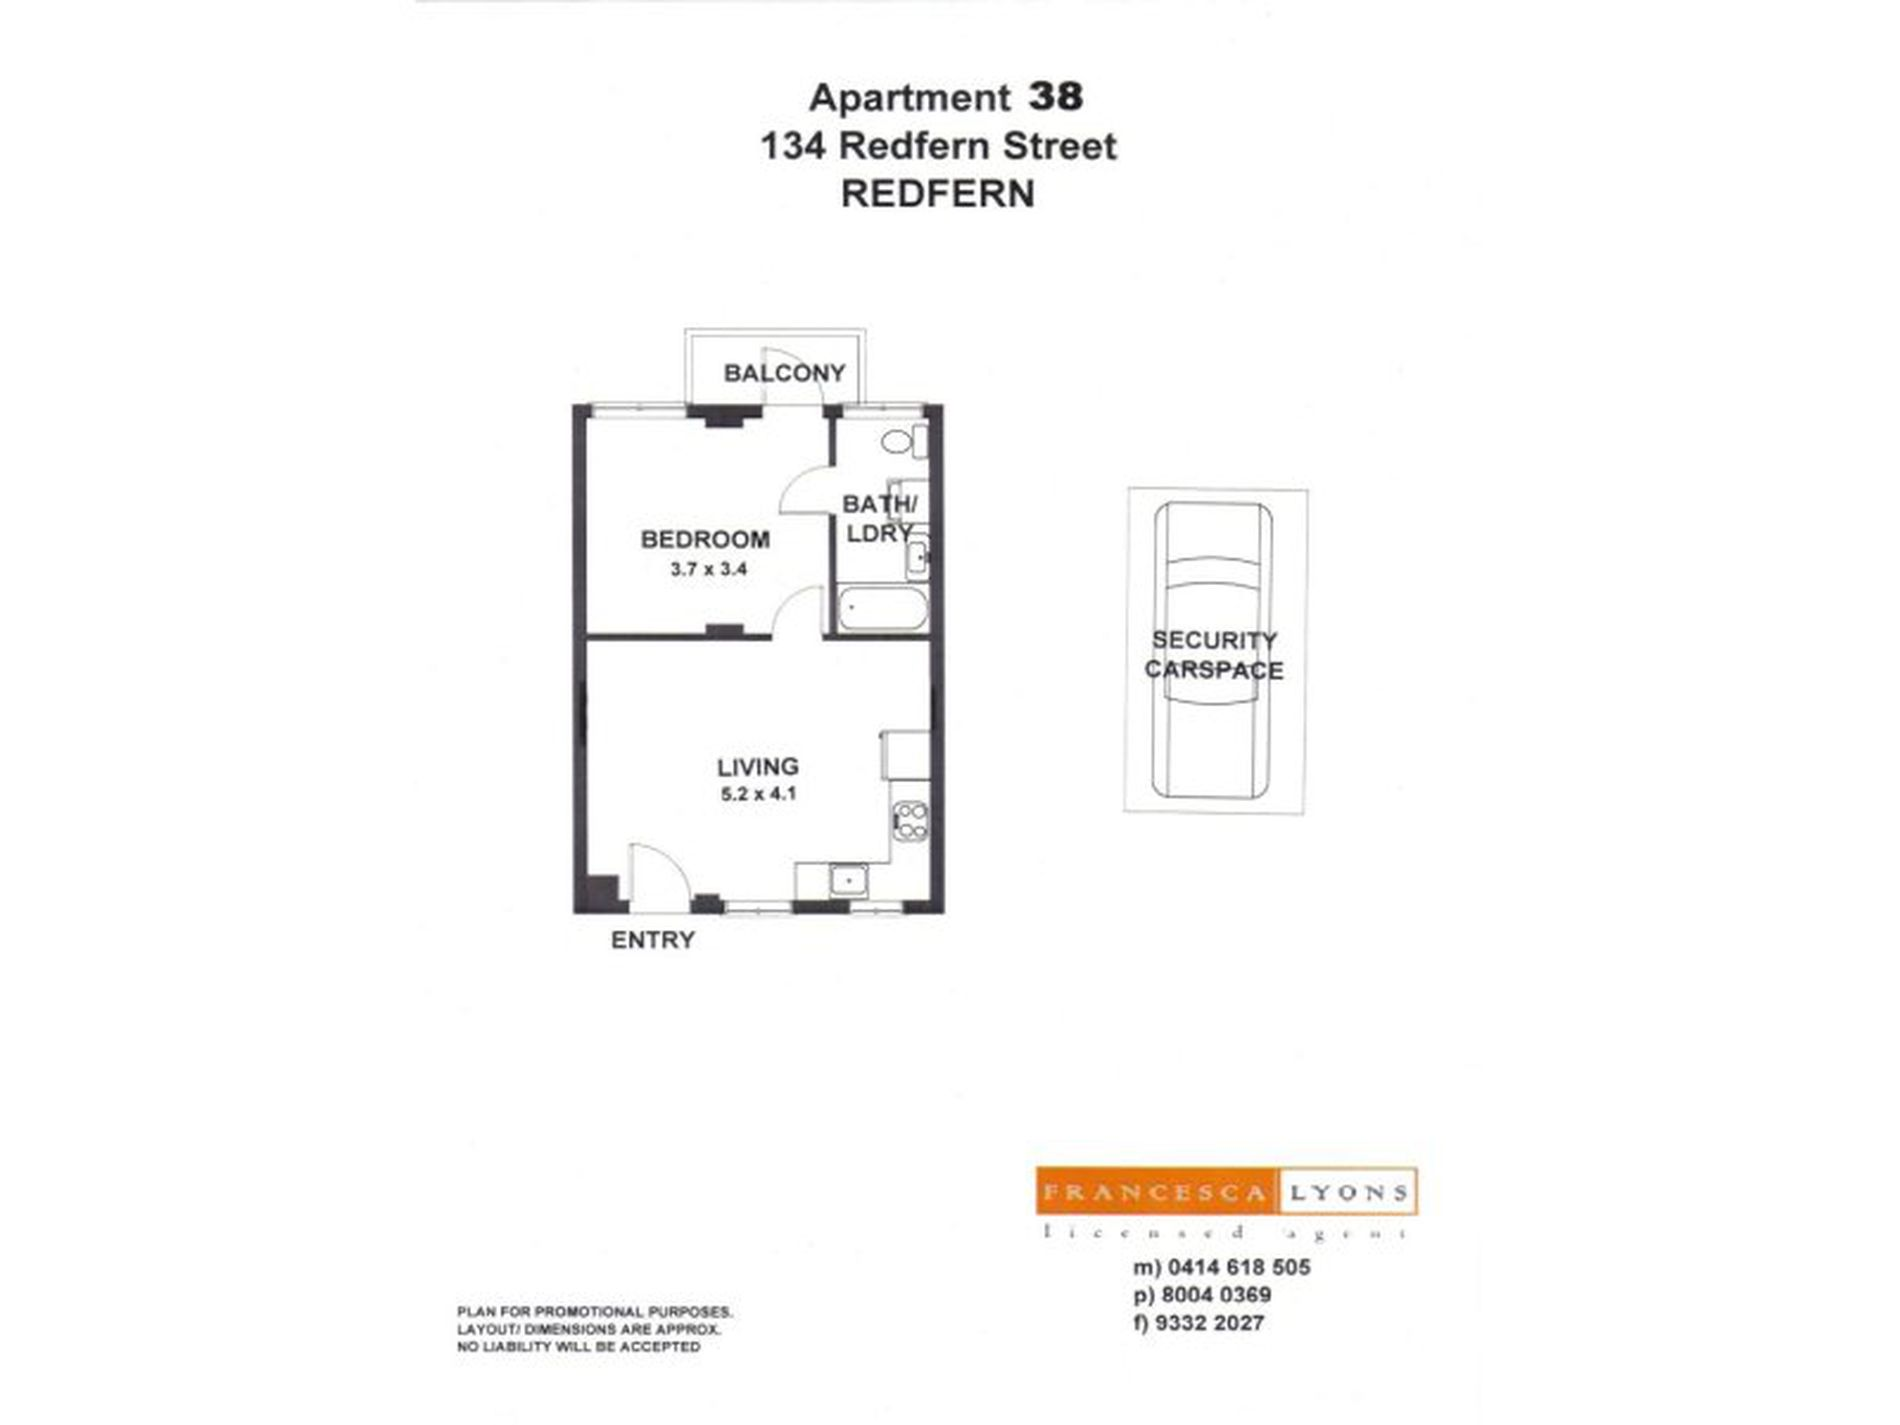 38 / 134 Redfern Street, Redfern